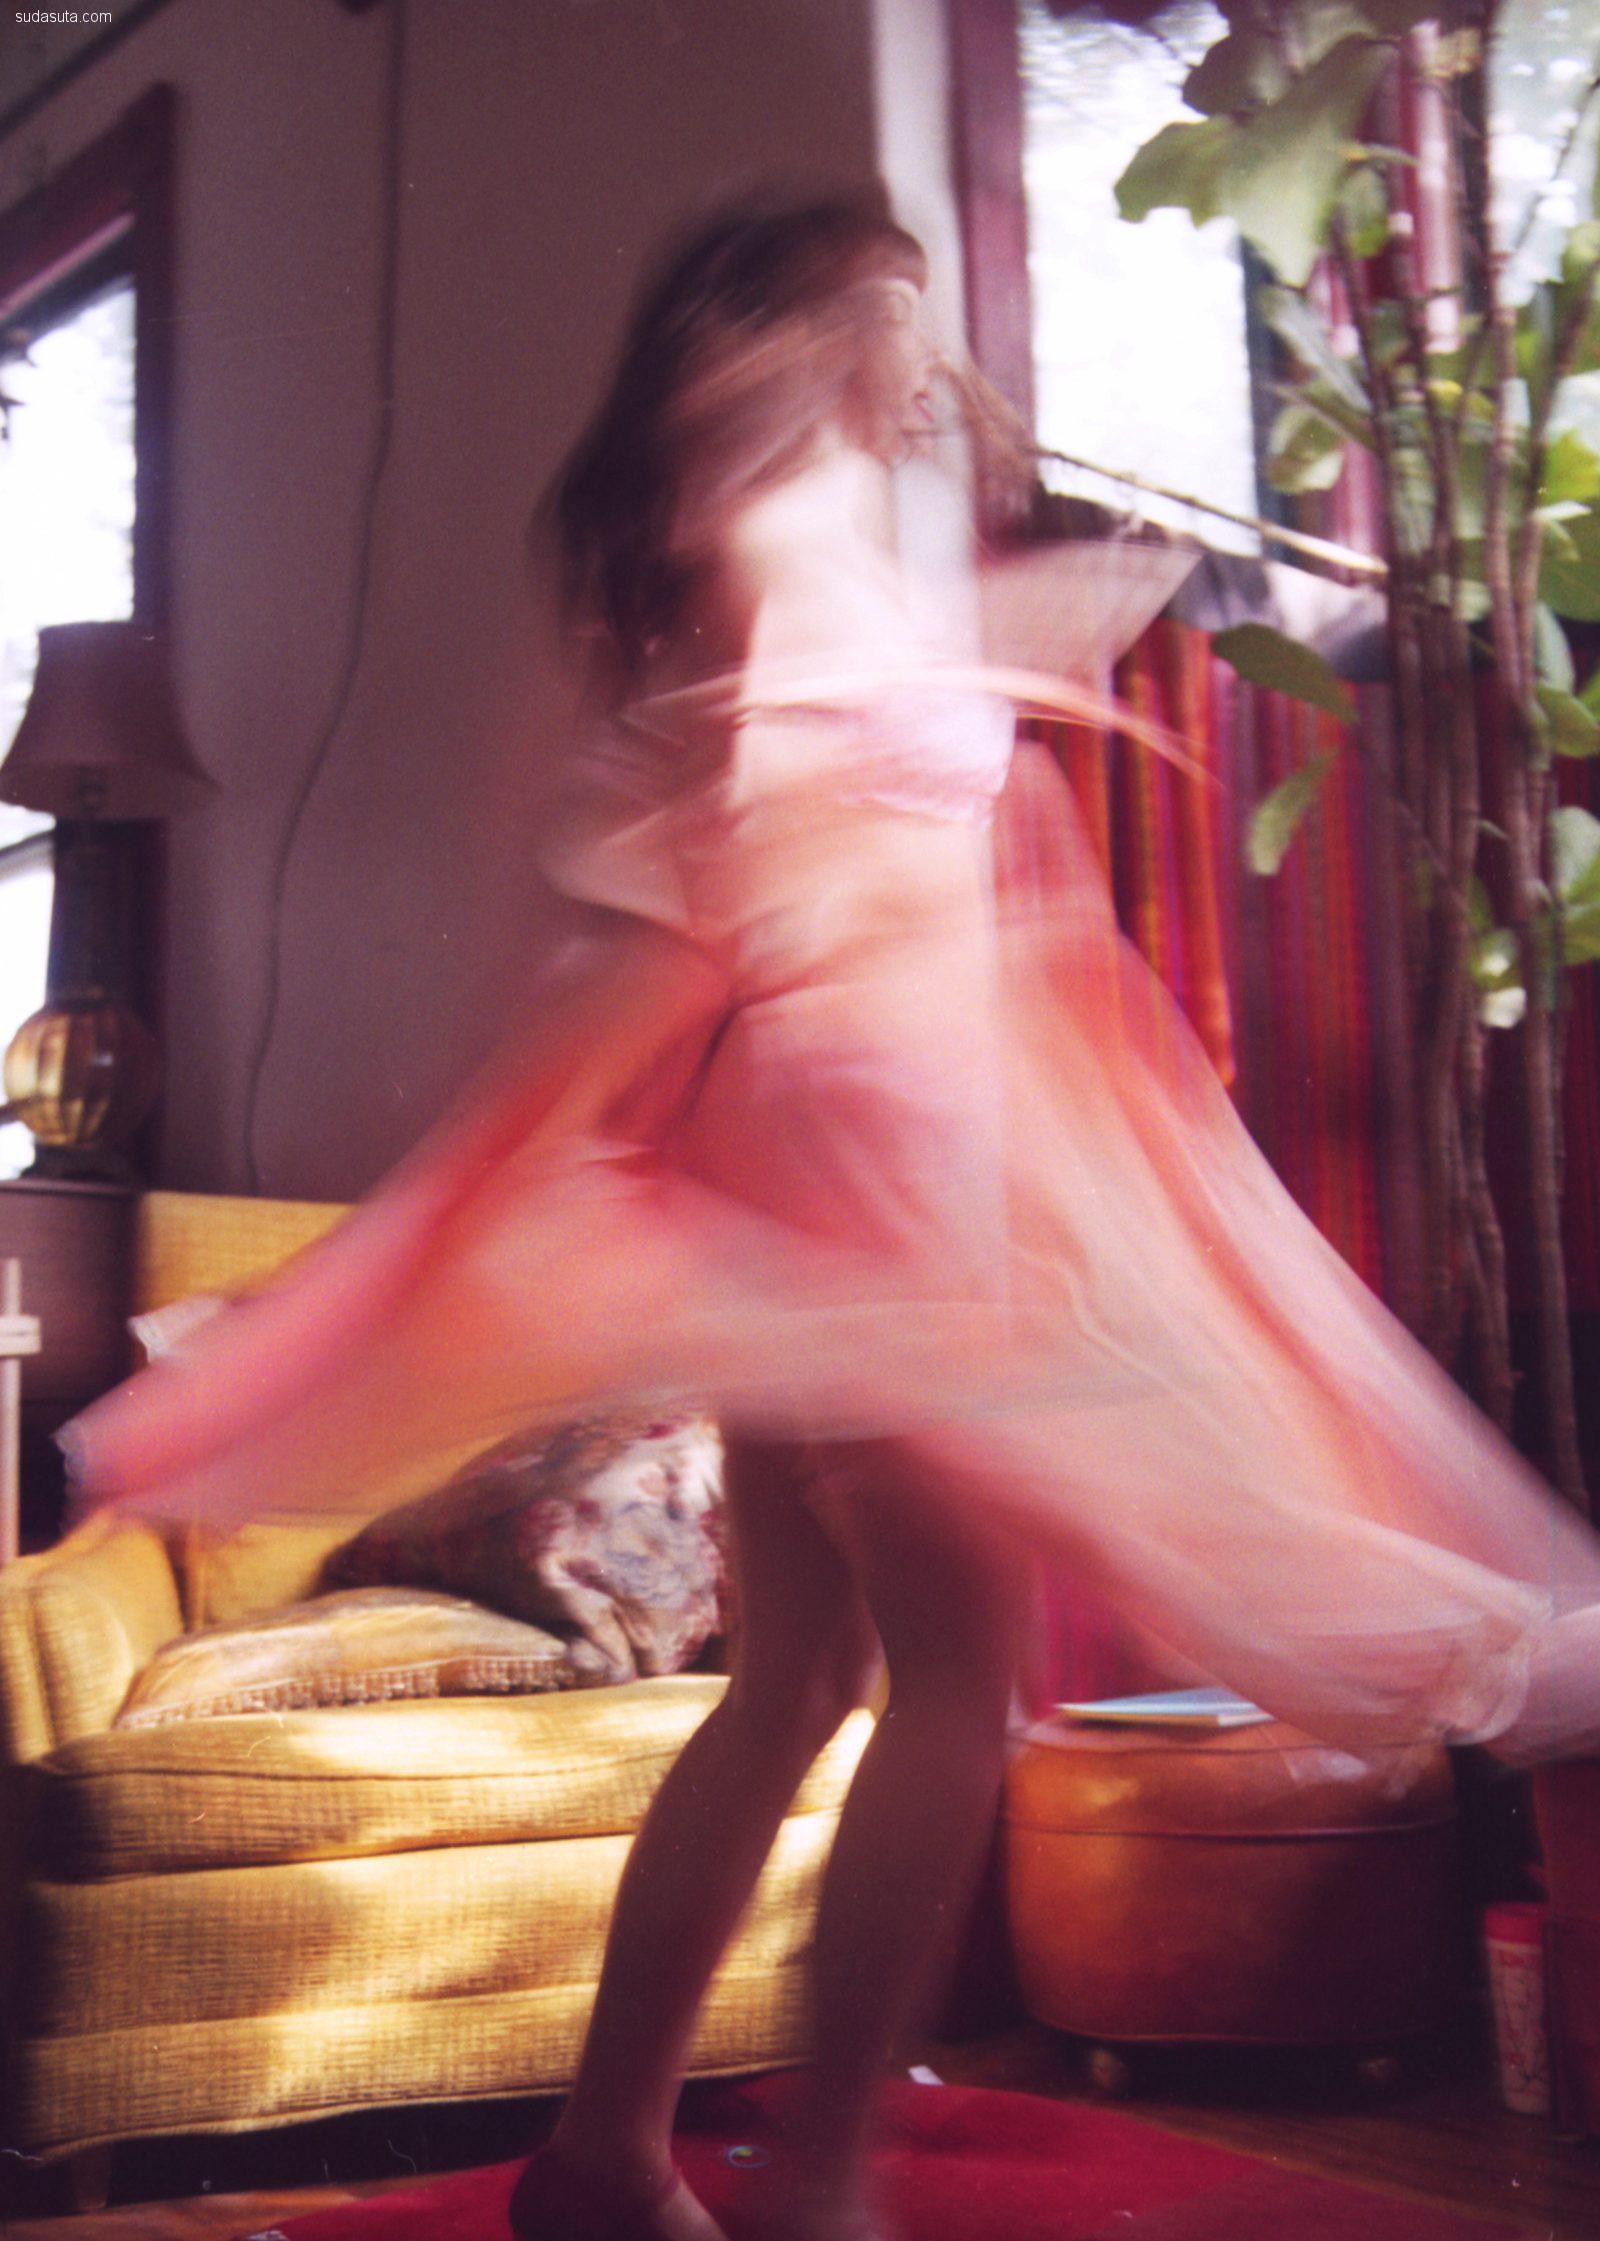 Hana Haley 时尚摄影欣赏